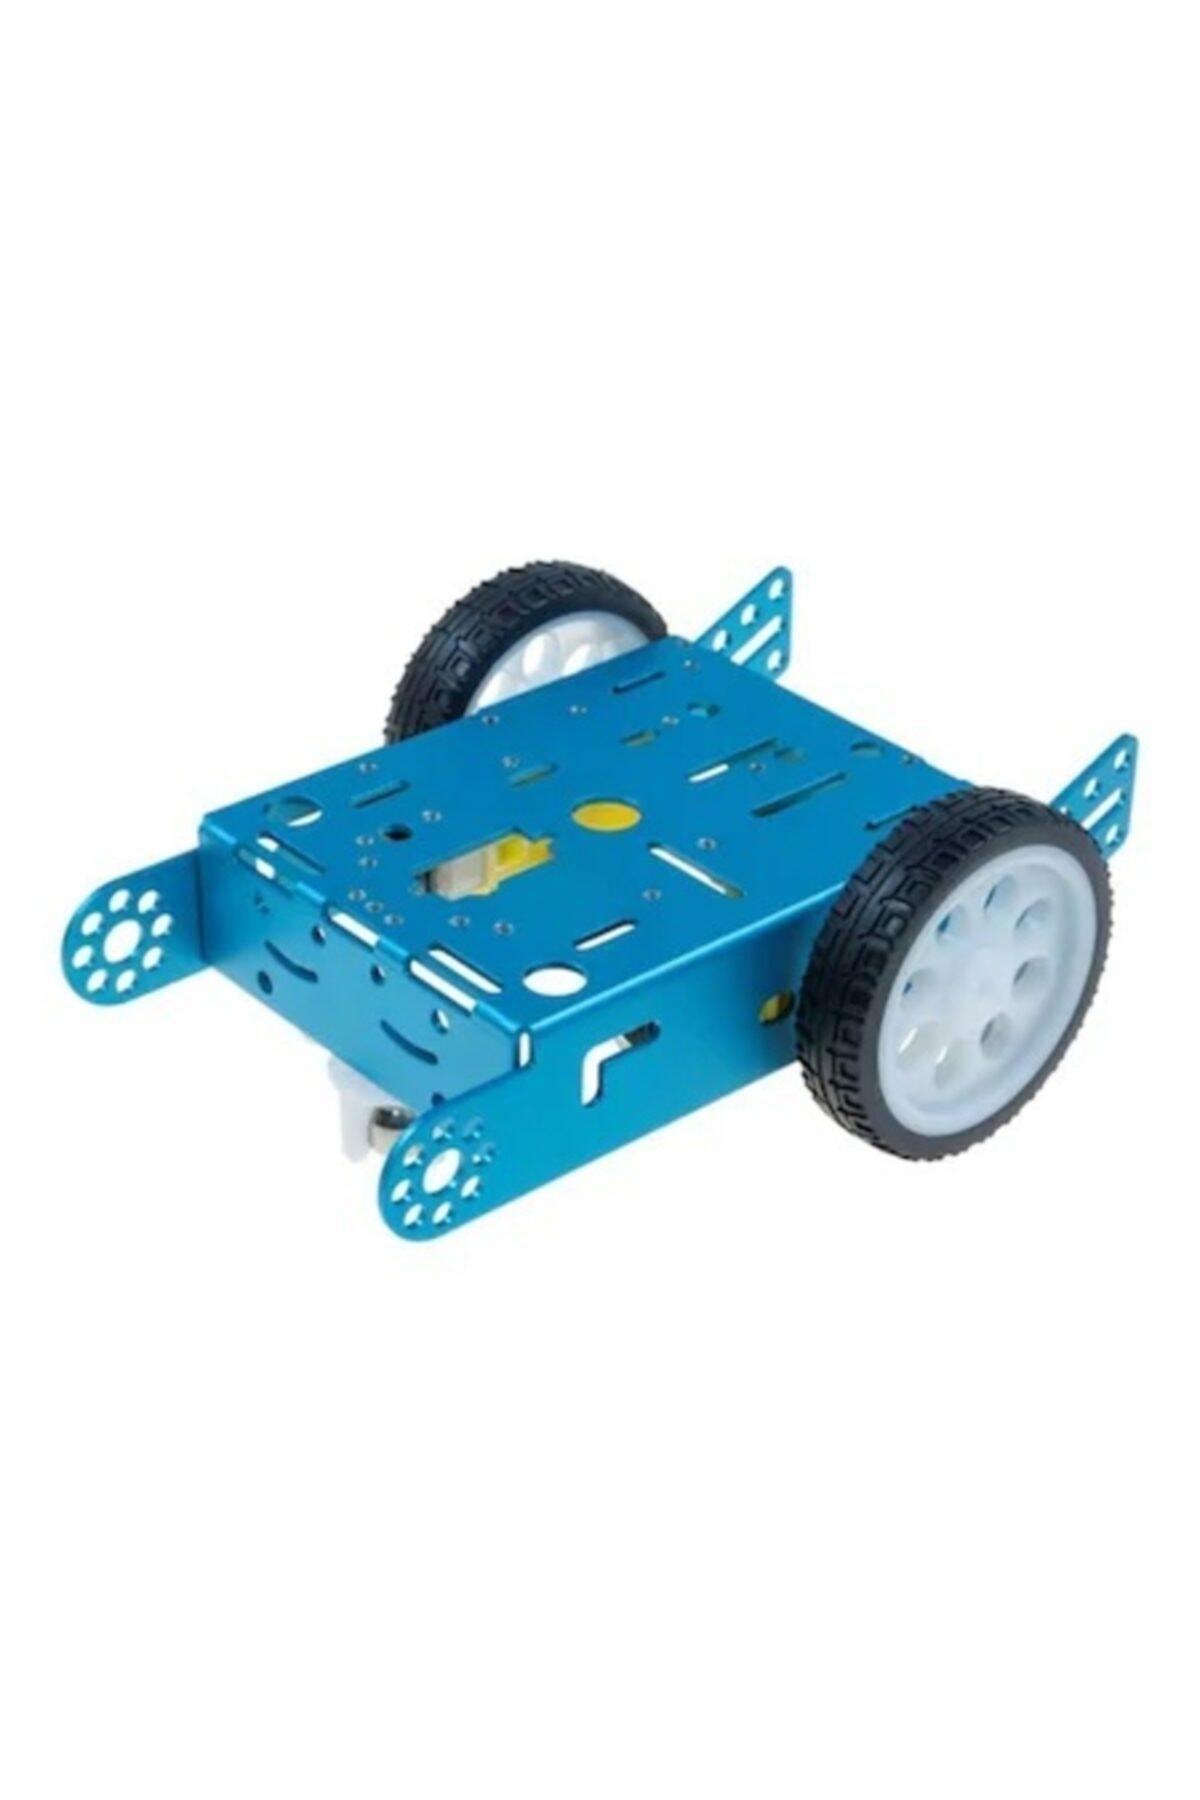 BAKAY Mbot Alüminyum Araç Kiti 2wd Mavi ( Motor Ve Tekerlek Dahil) 1